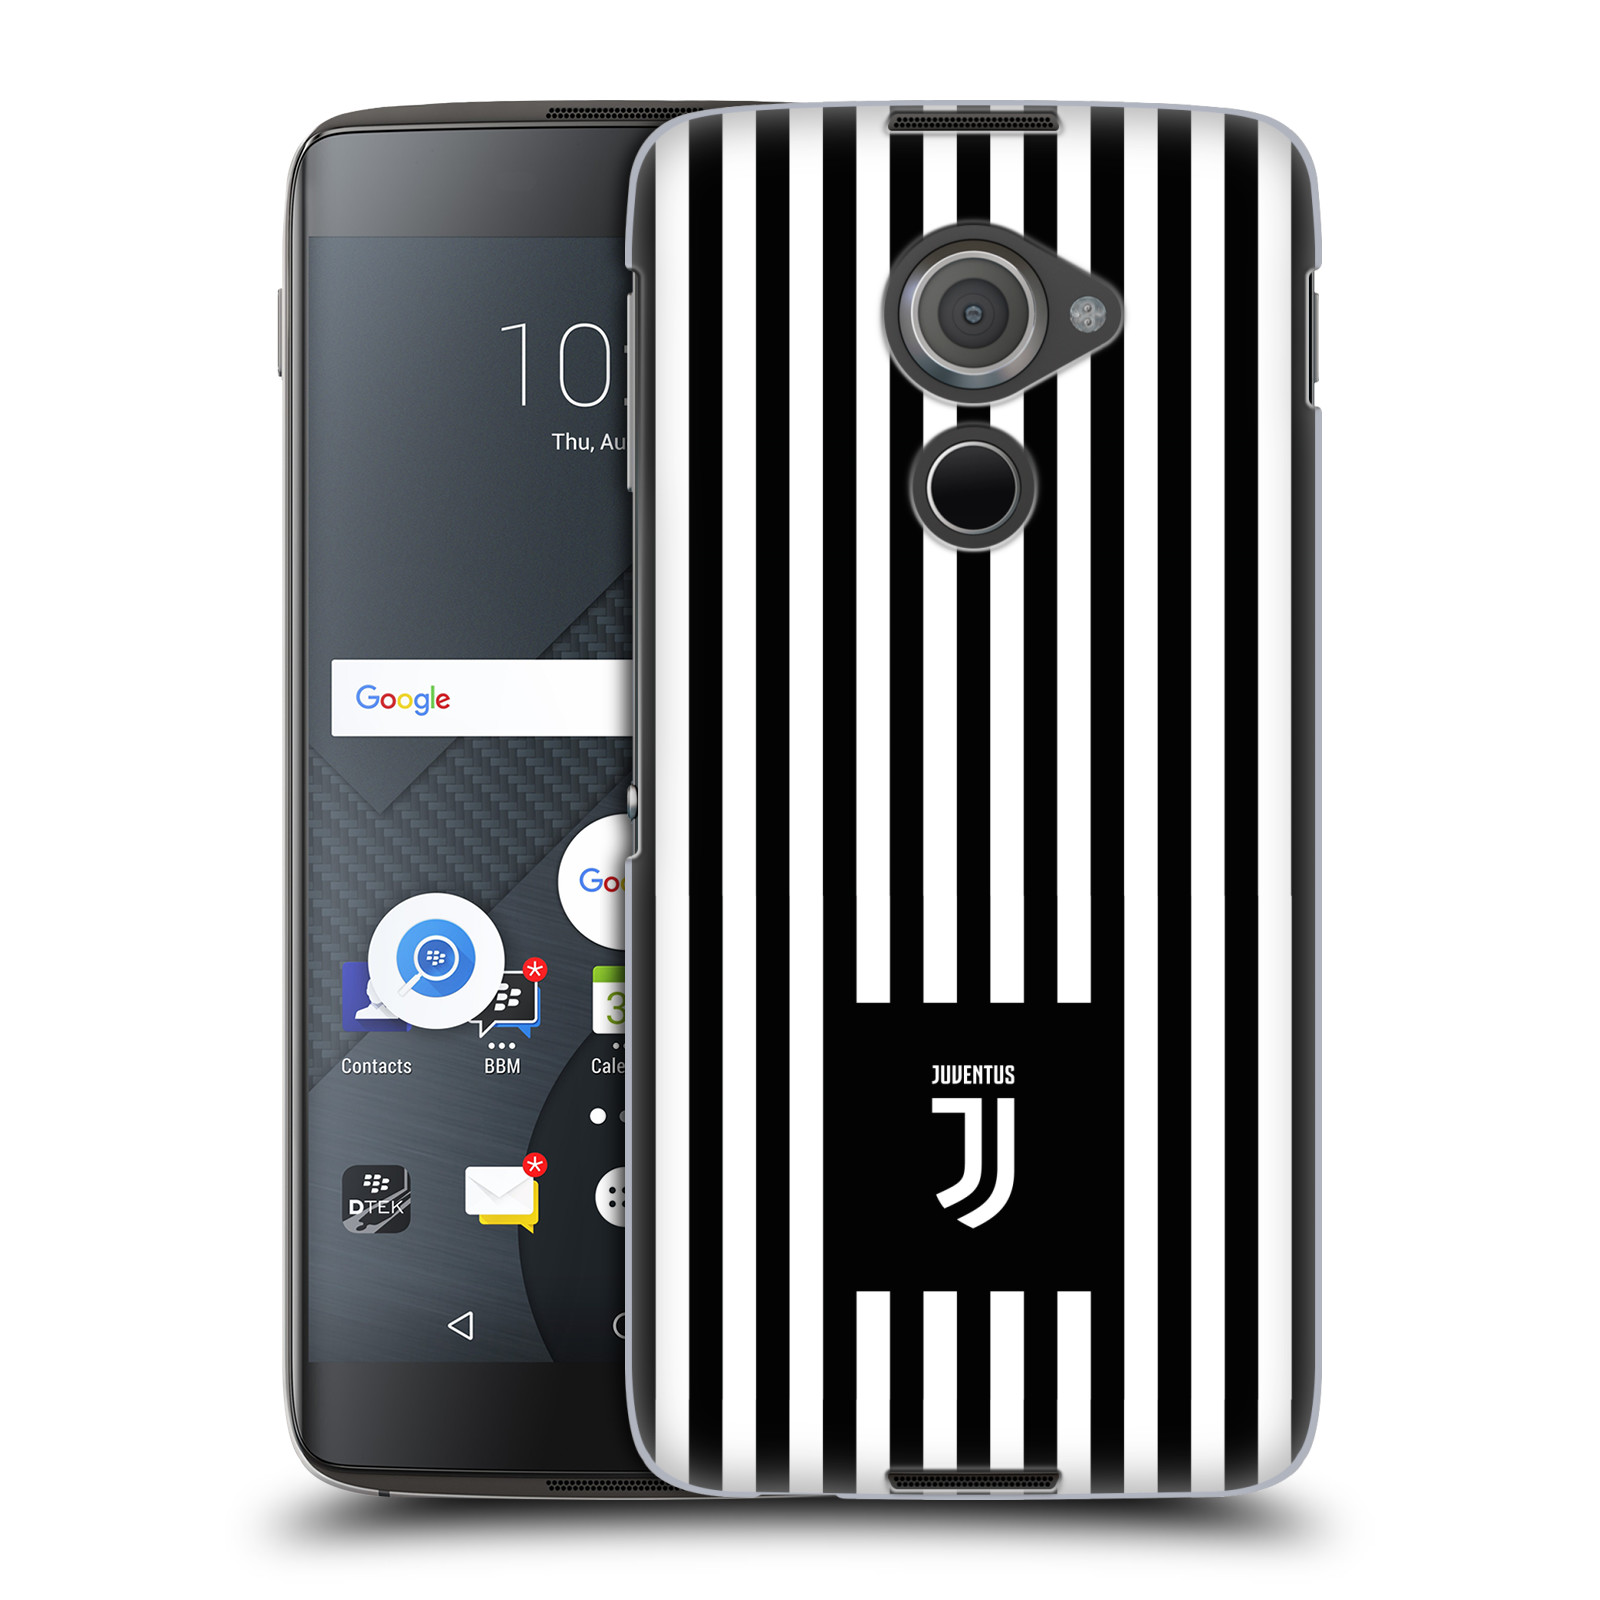 Plastové pouzdro na mobil Blackberry DTEK60 (Argon) - Head Case - Juventus FC - Nové logo - Pruhy